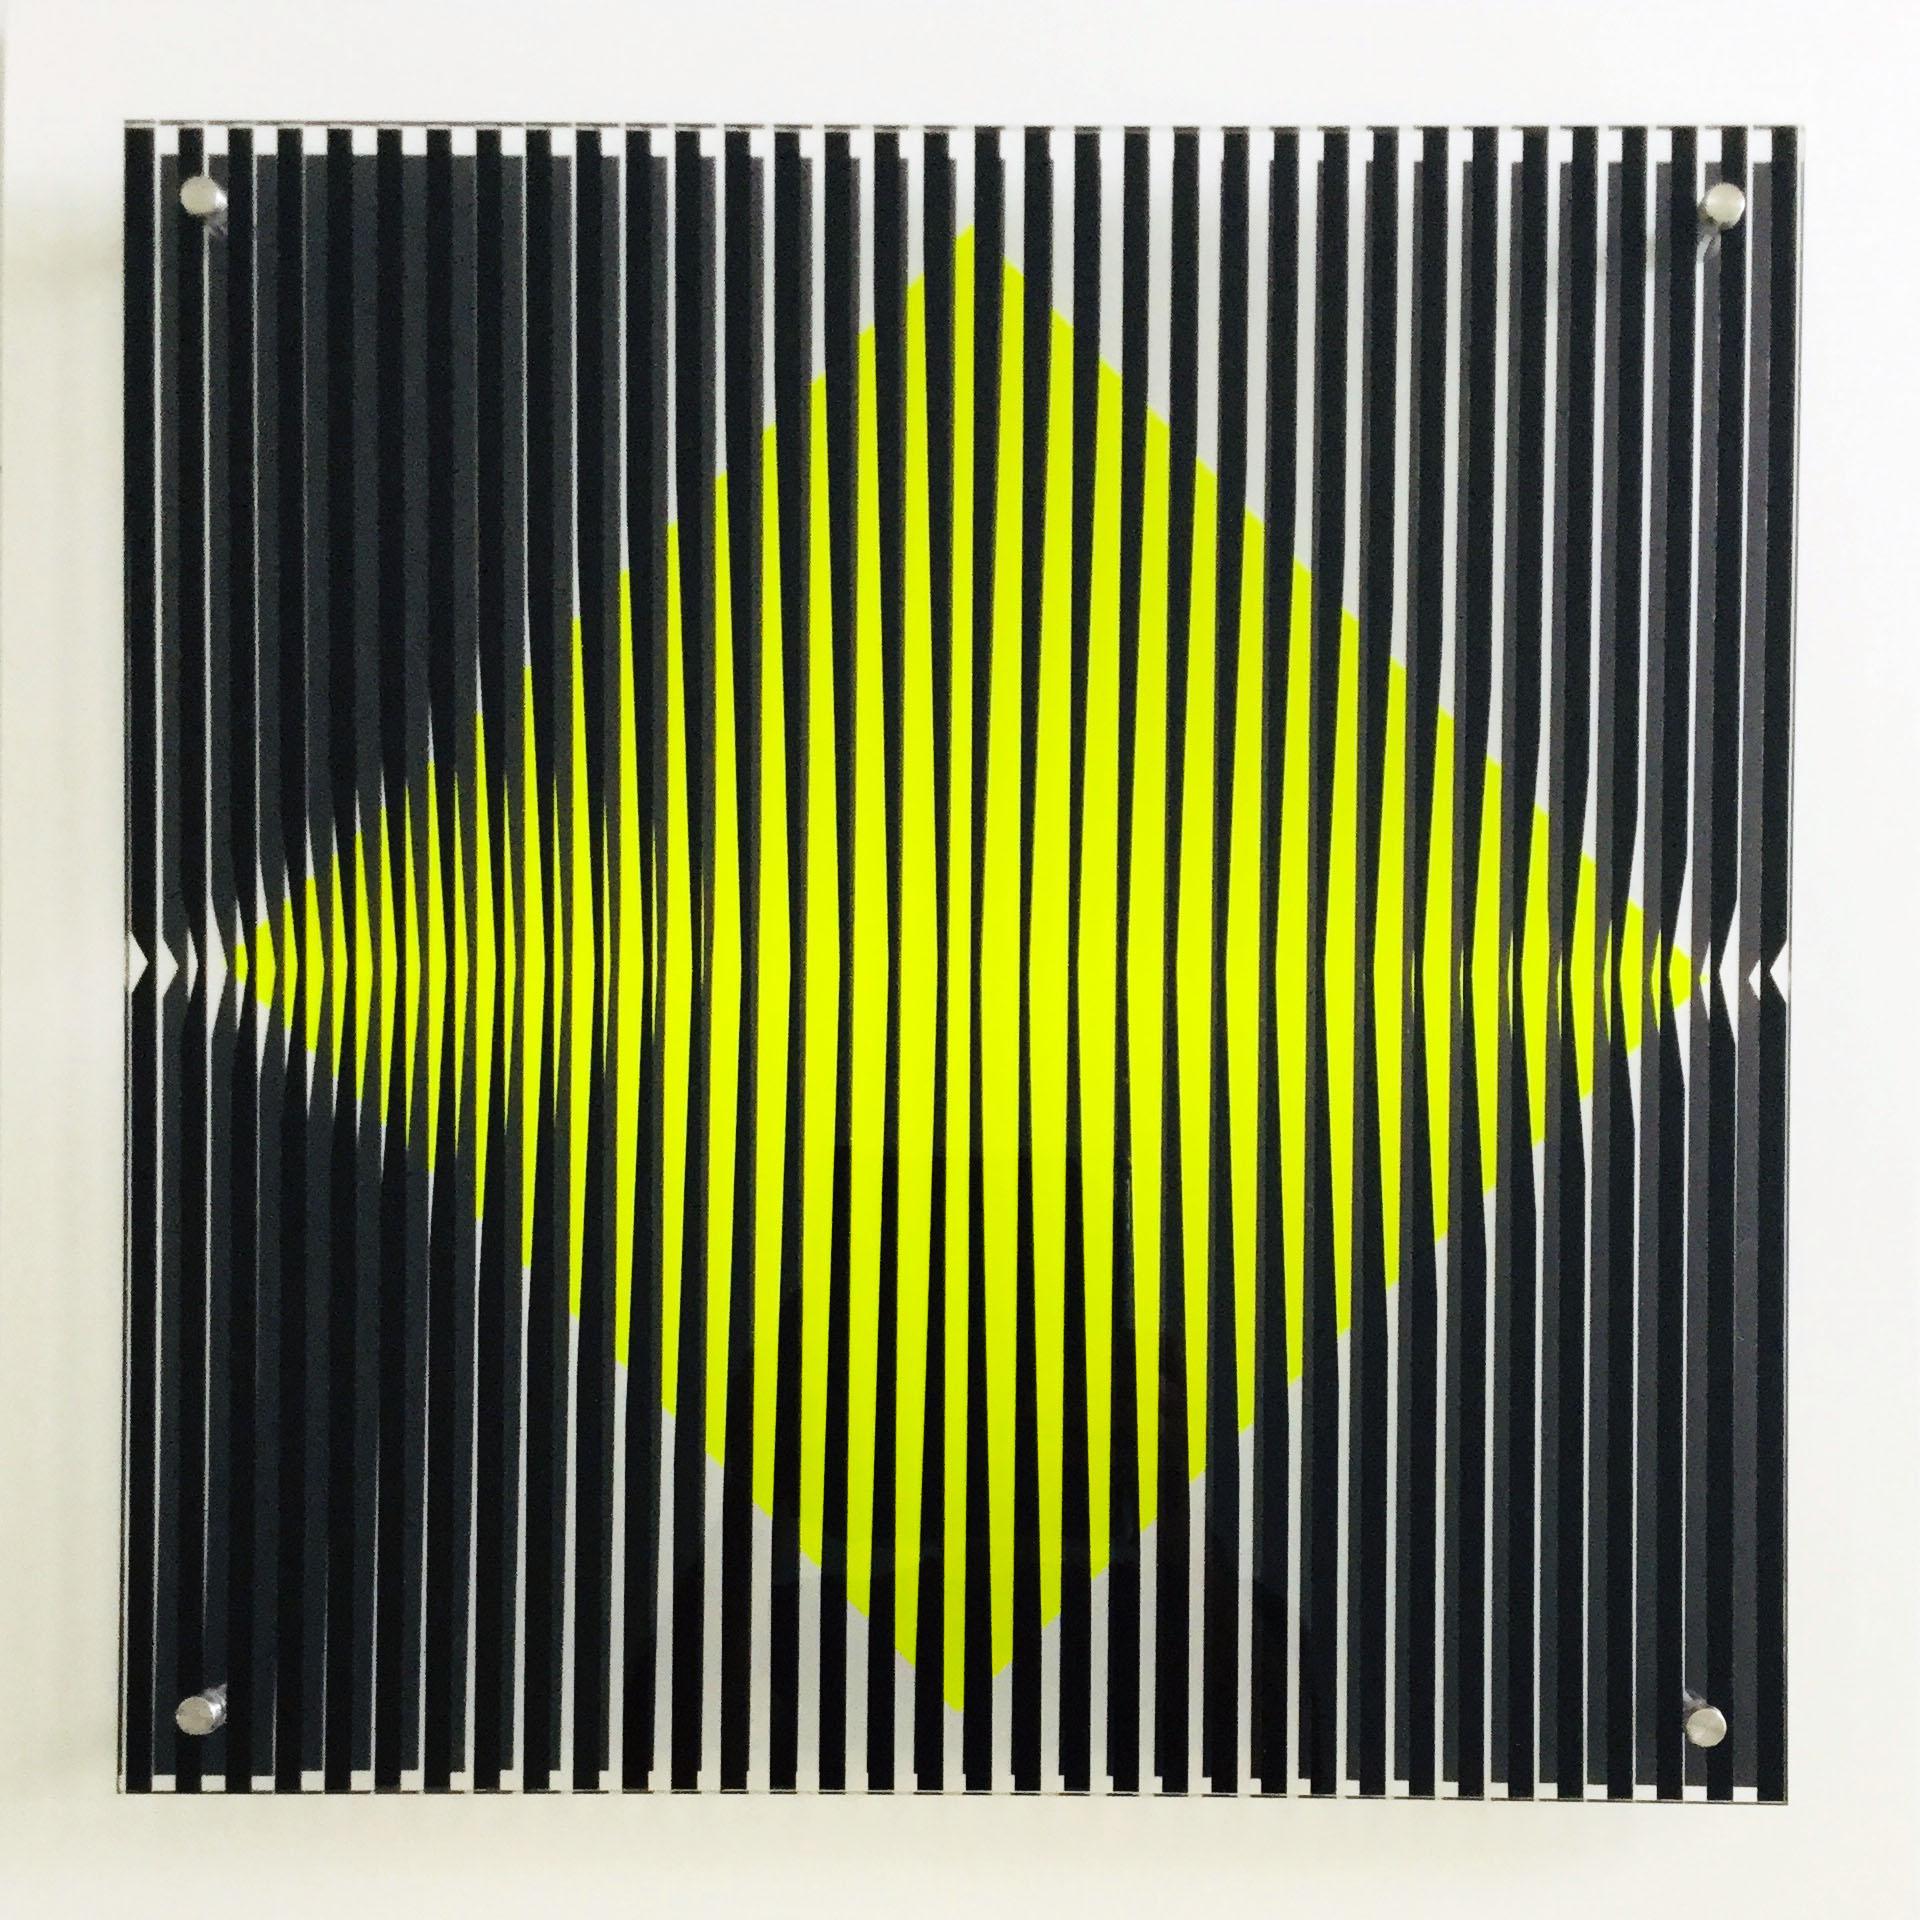 Spectrun Yellow